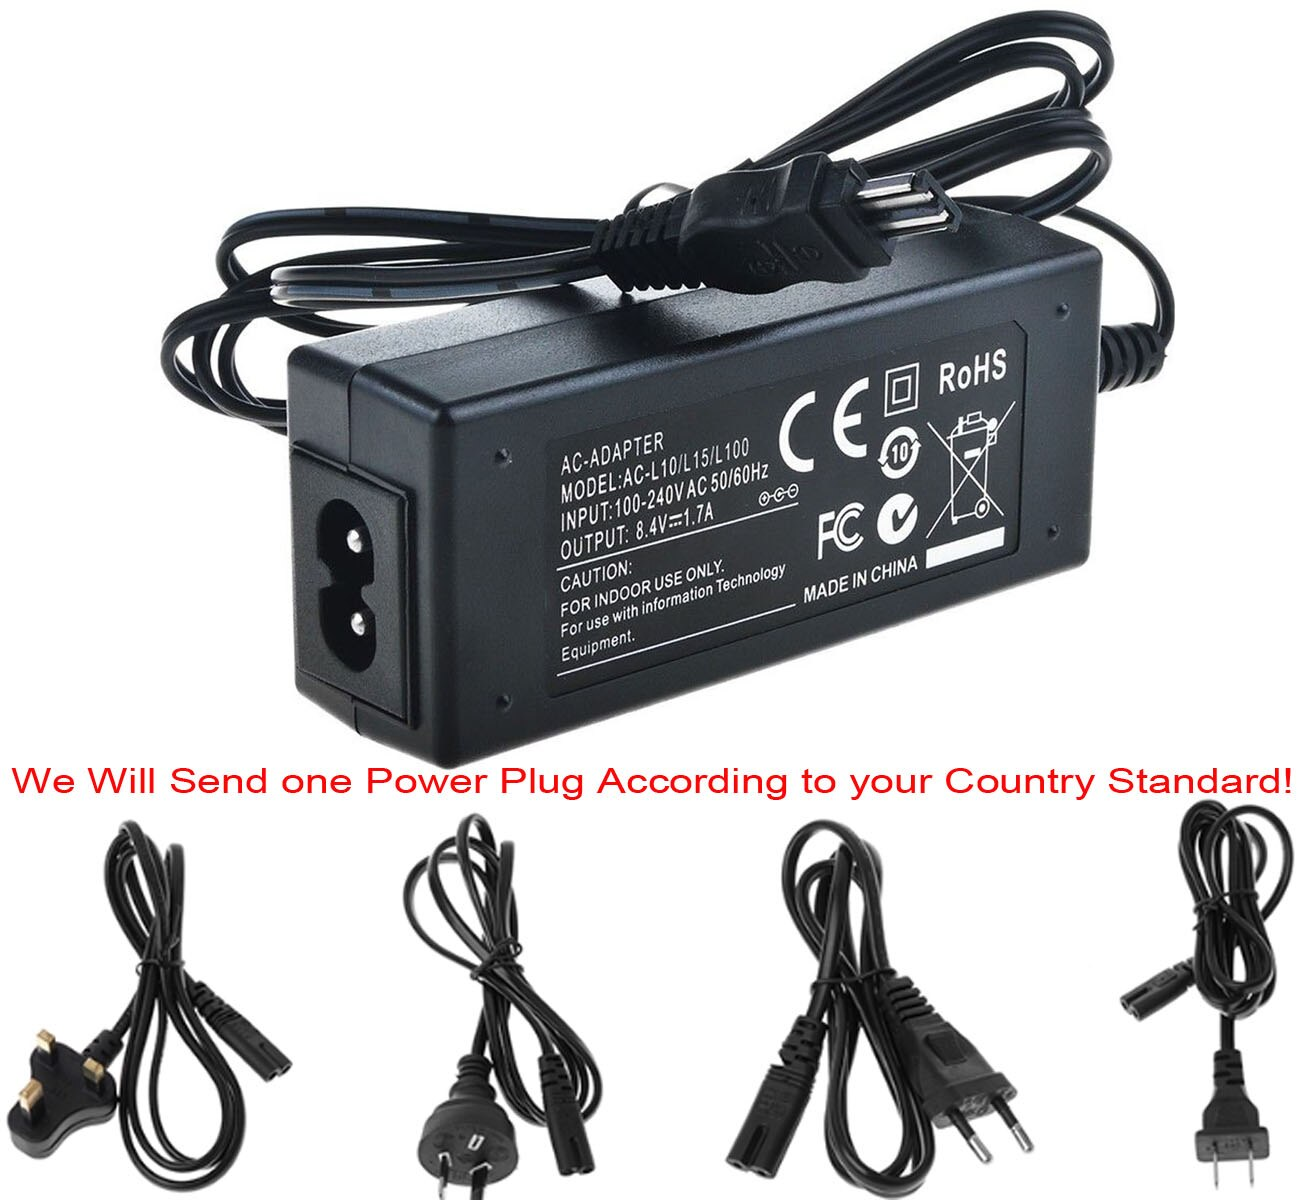 AC адаптер питания зарядное устройство для Sony AC-L10, AC-L10A, AC-L10B, AC-L10C, AC-L15, AC-L15A, AC-L15B, AC-L15C, AC-L100, AC-L100C